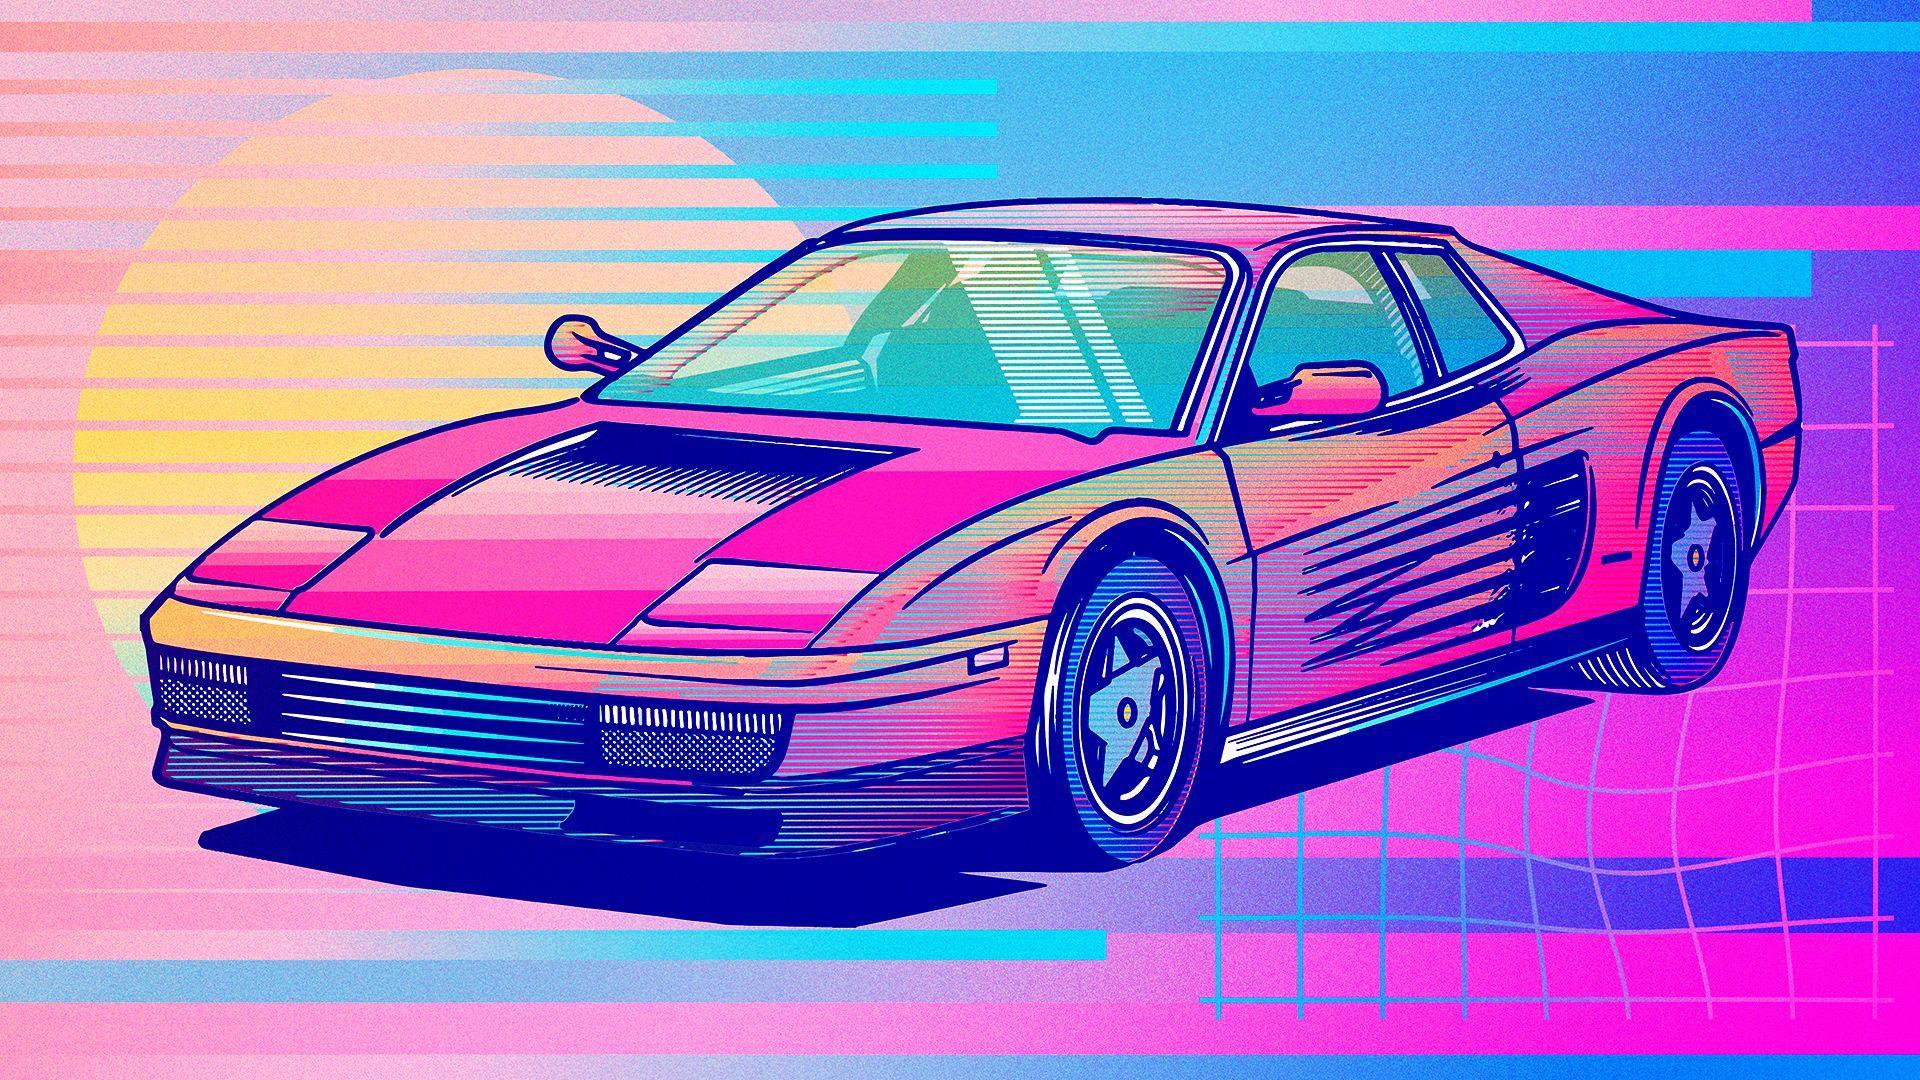 Vaporwave Car Desktop Wallpapers Top Free Vaporwave Car Desktop Backgrounds Wallpaperaccess